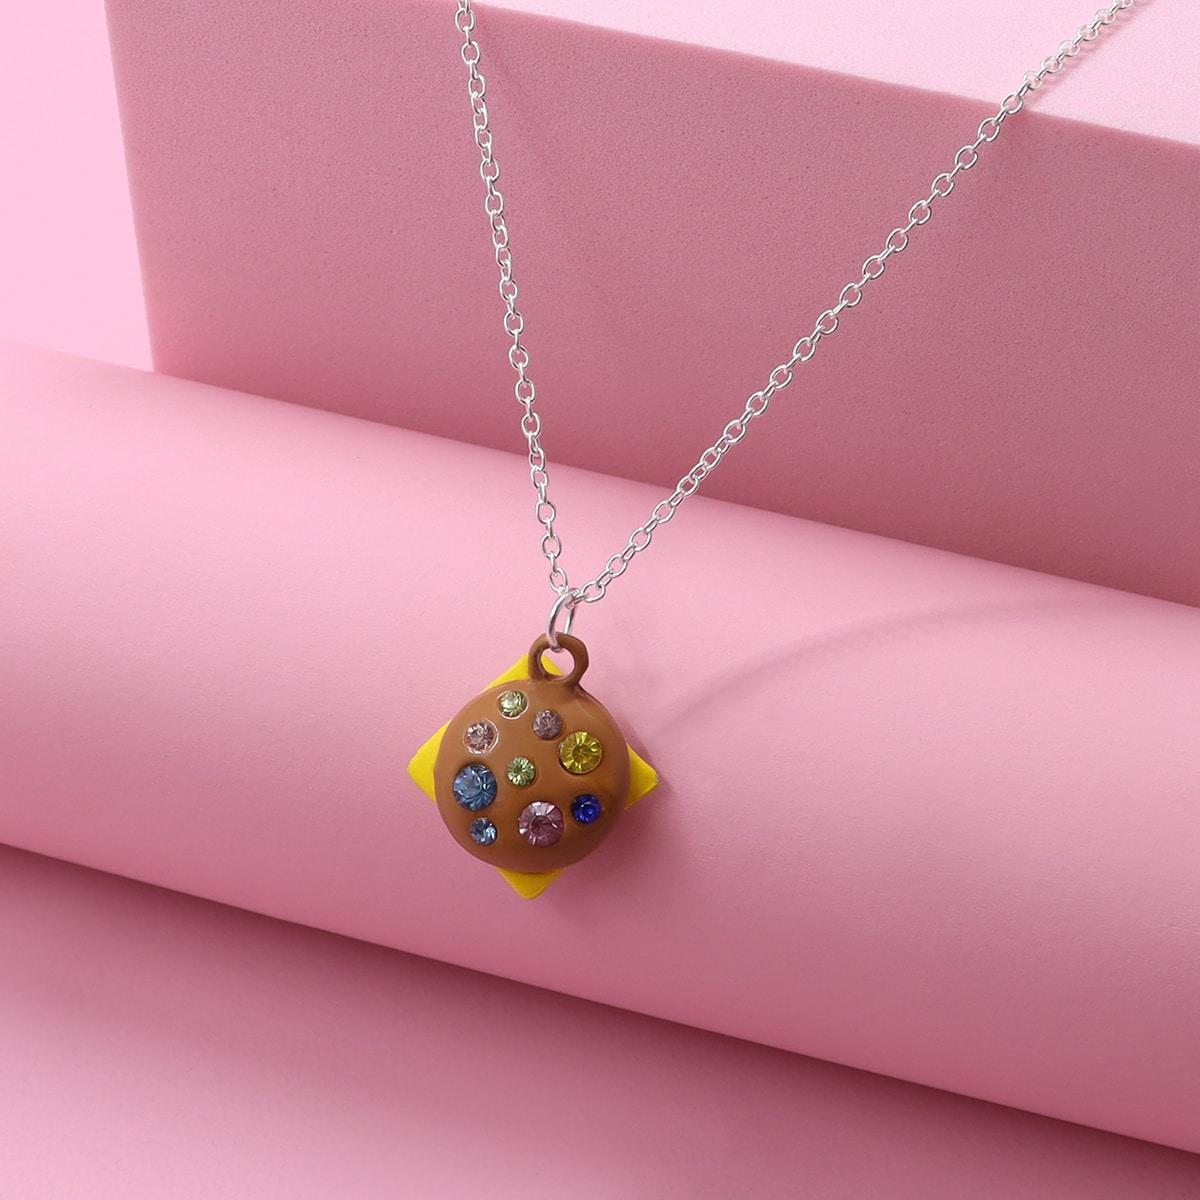 Collar de niñitas con diseño de diamante de imitación